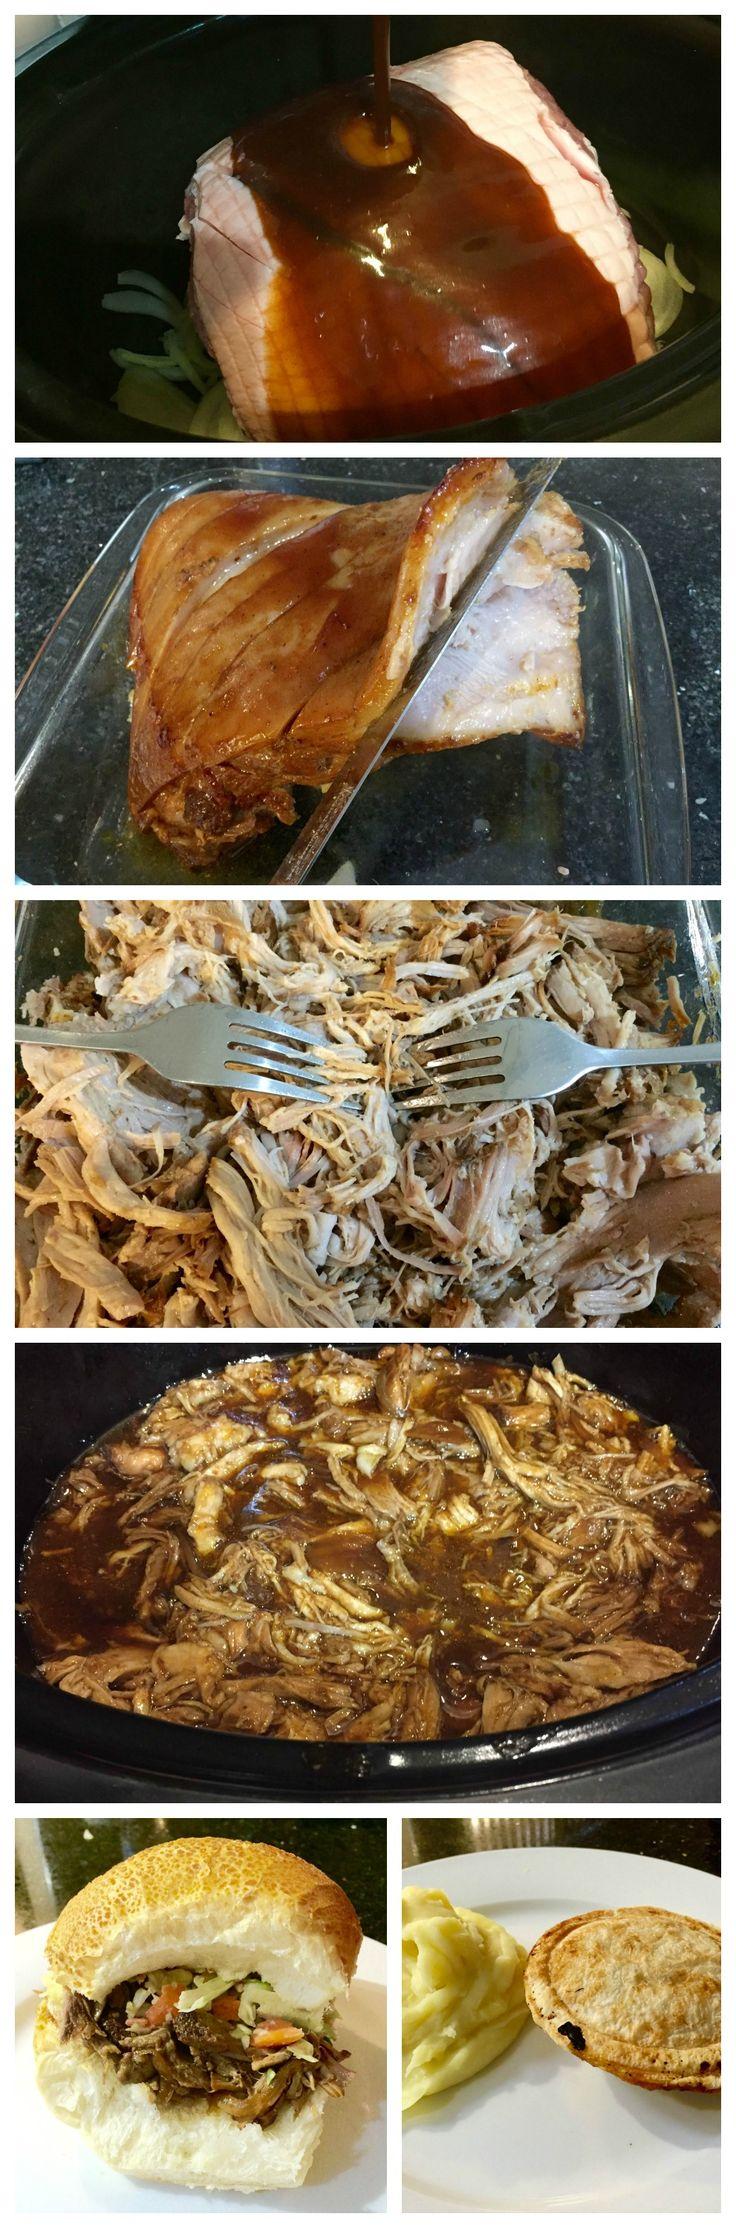 Slow Cooker - Sweet pulled pork recipe